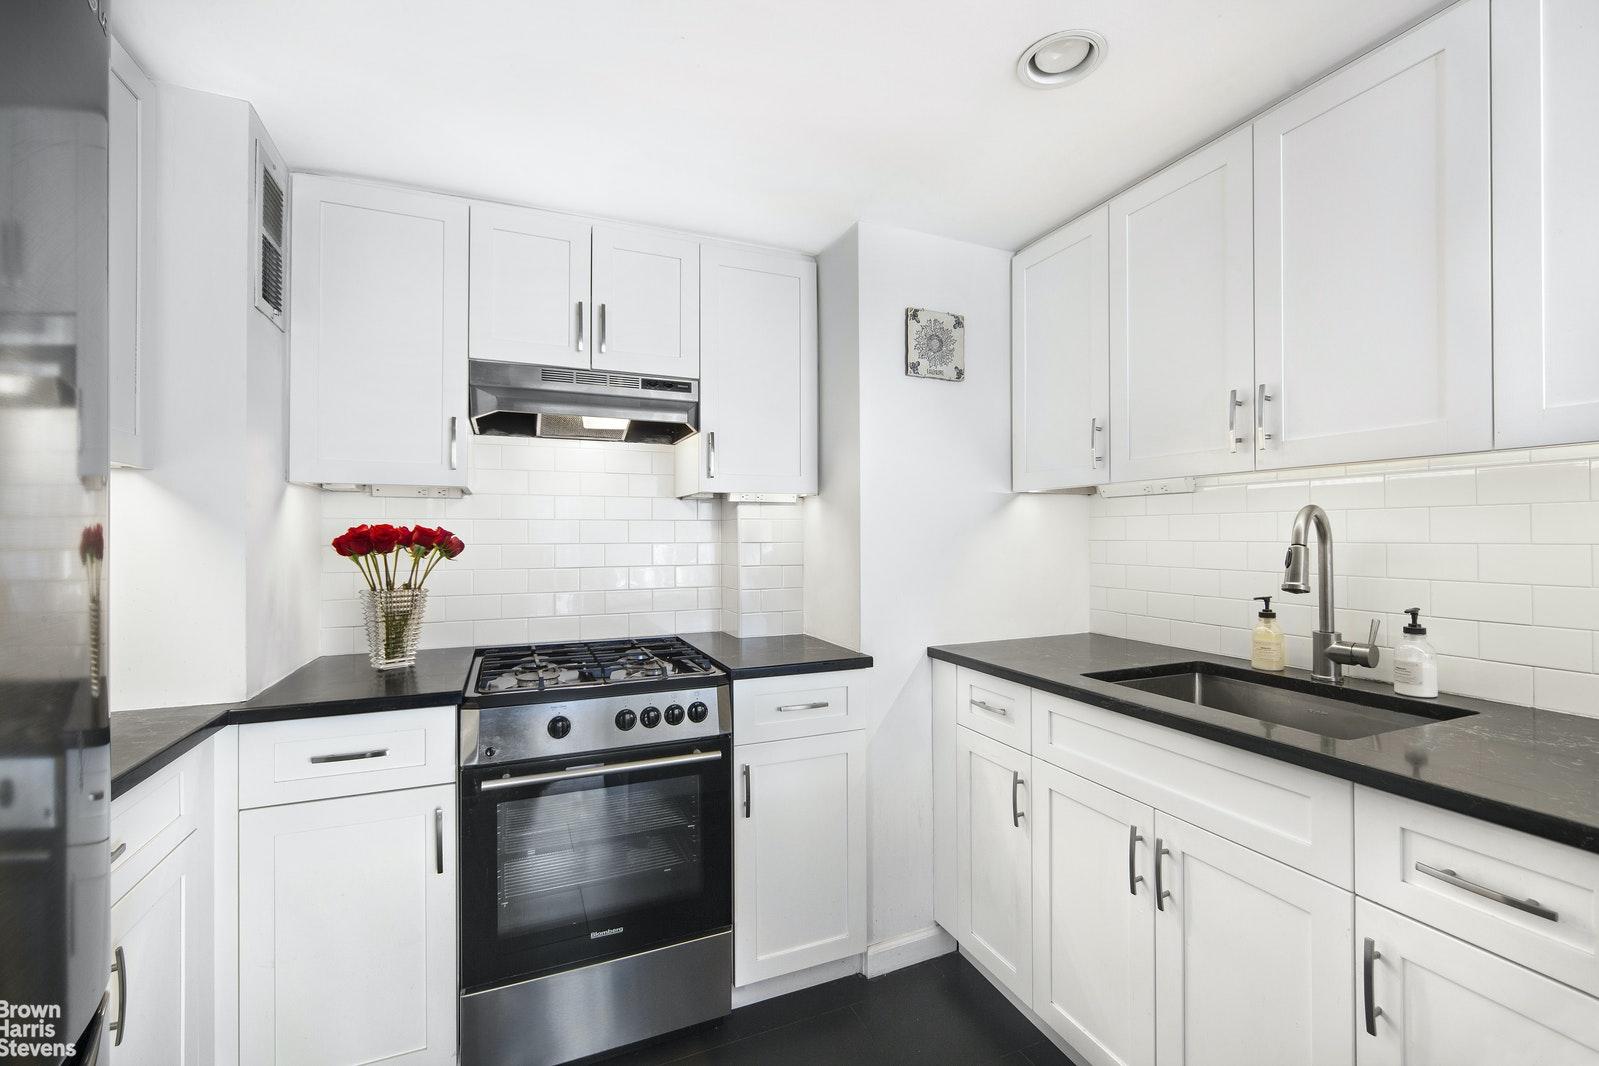 251 EAST 32ND STREET 19F, Murray Hill Kips Bay, $599,000, Web #: 20650228